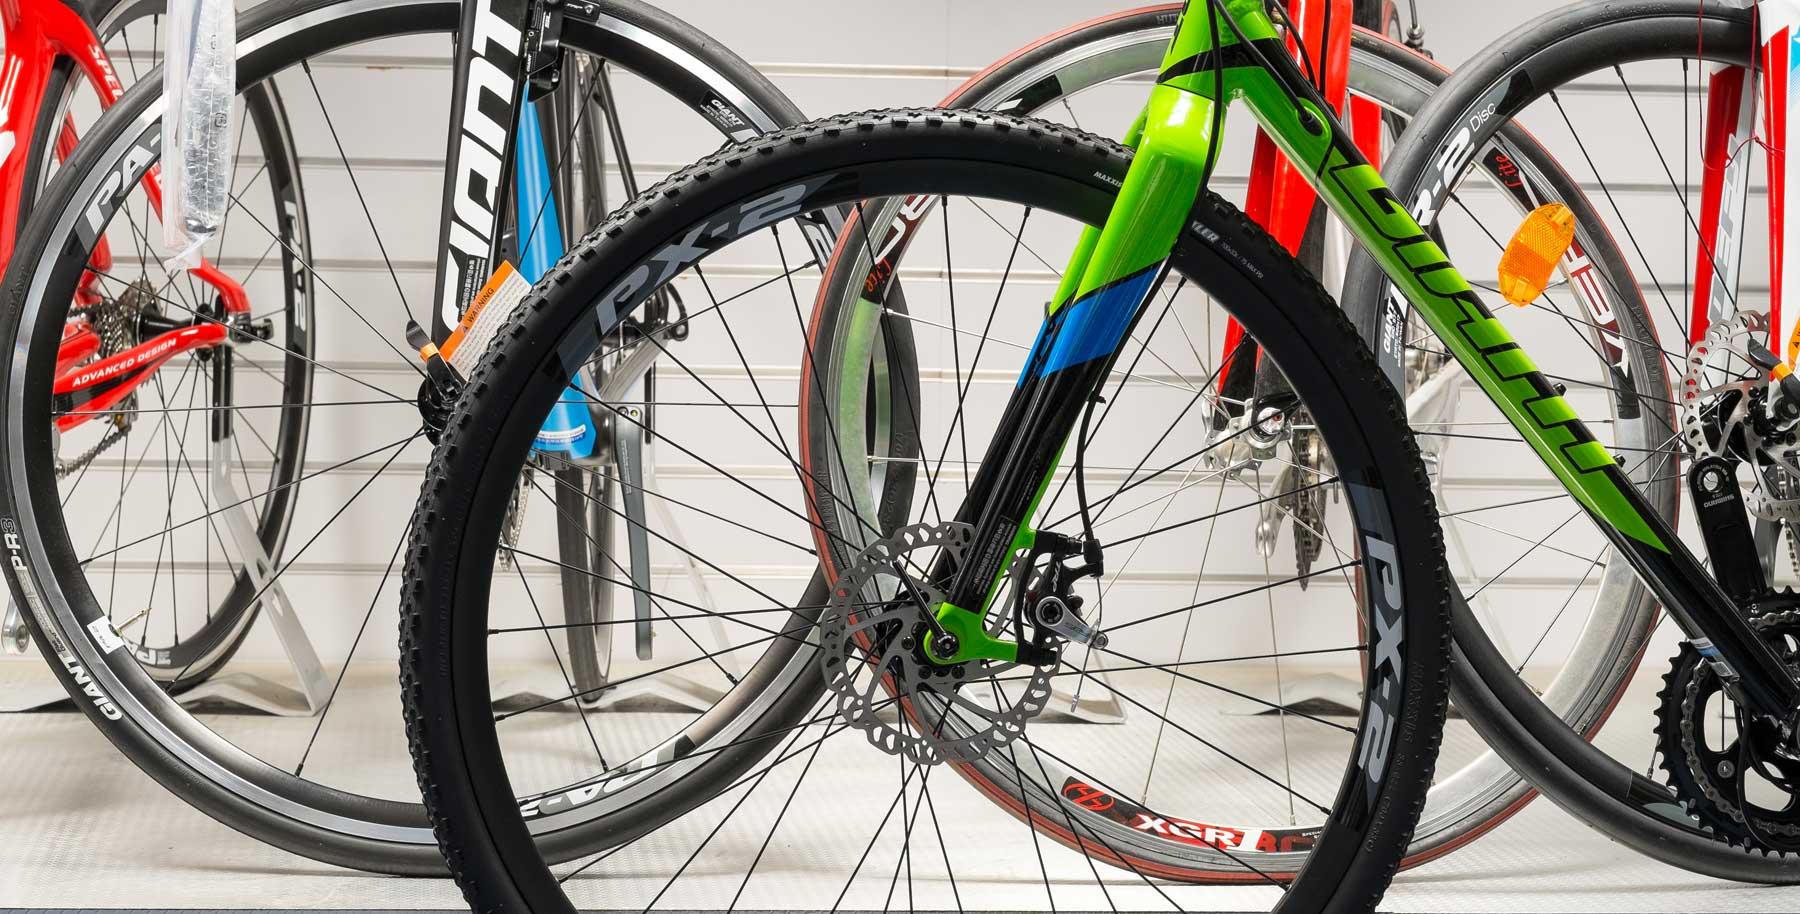 Giant 2016 bikes Cornwall